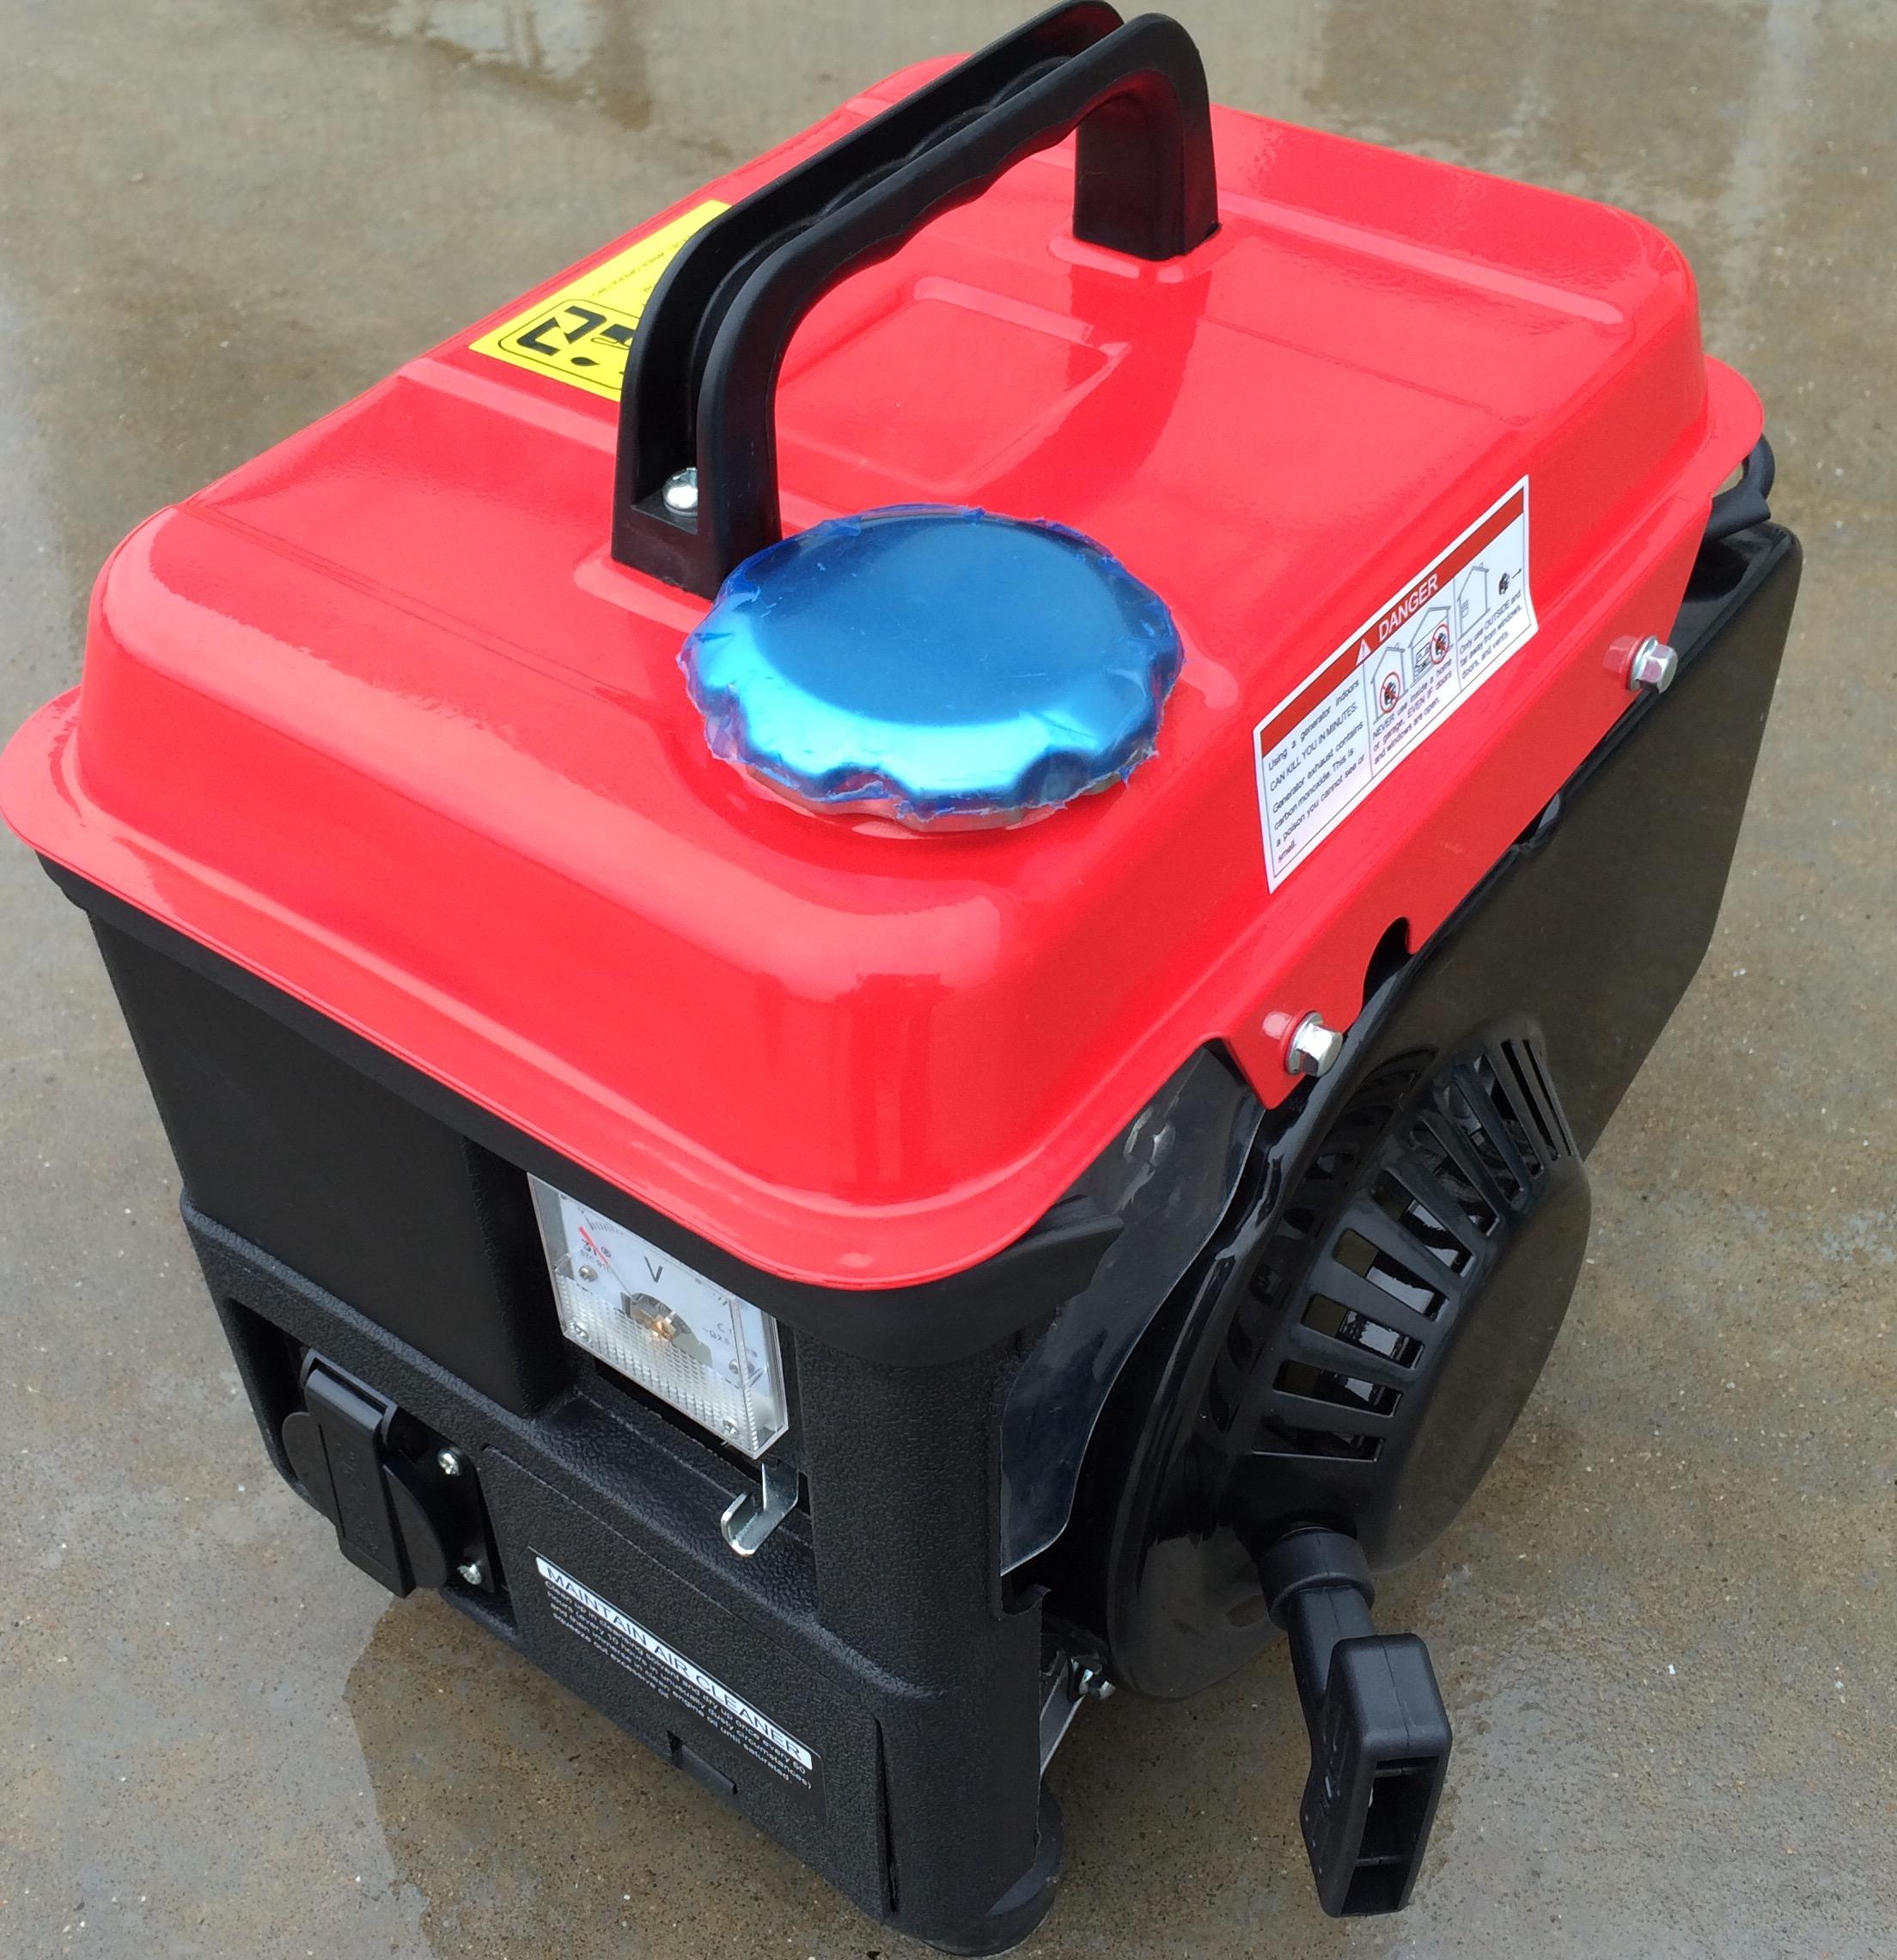 Toppest quality 800W's gasolene inverter generator